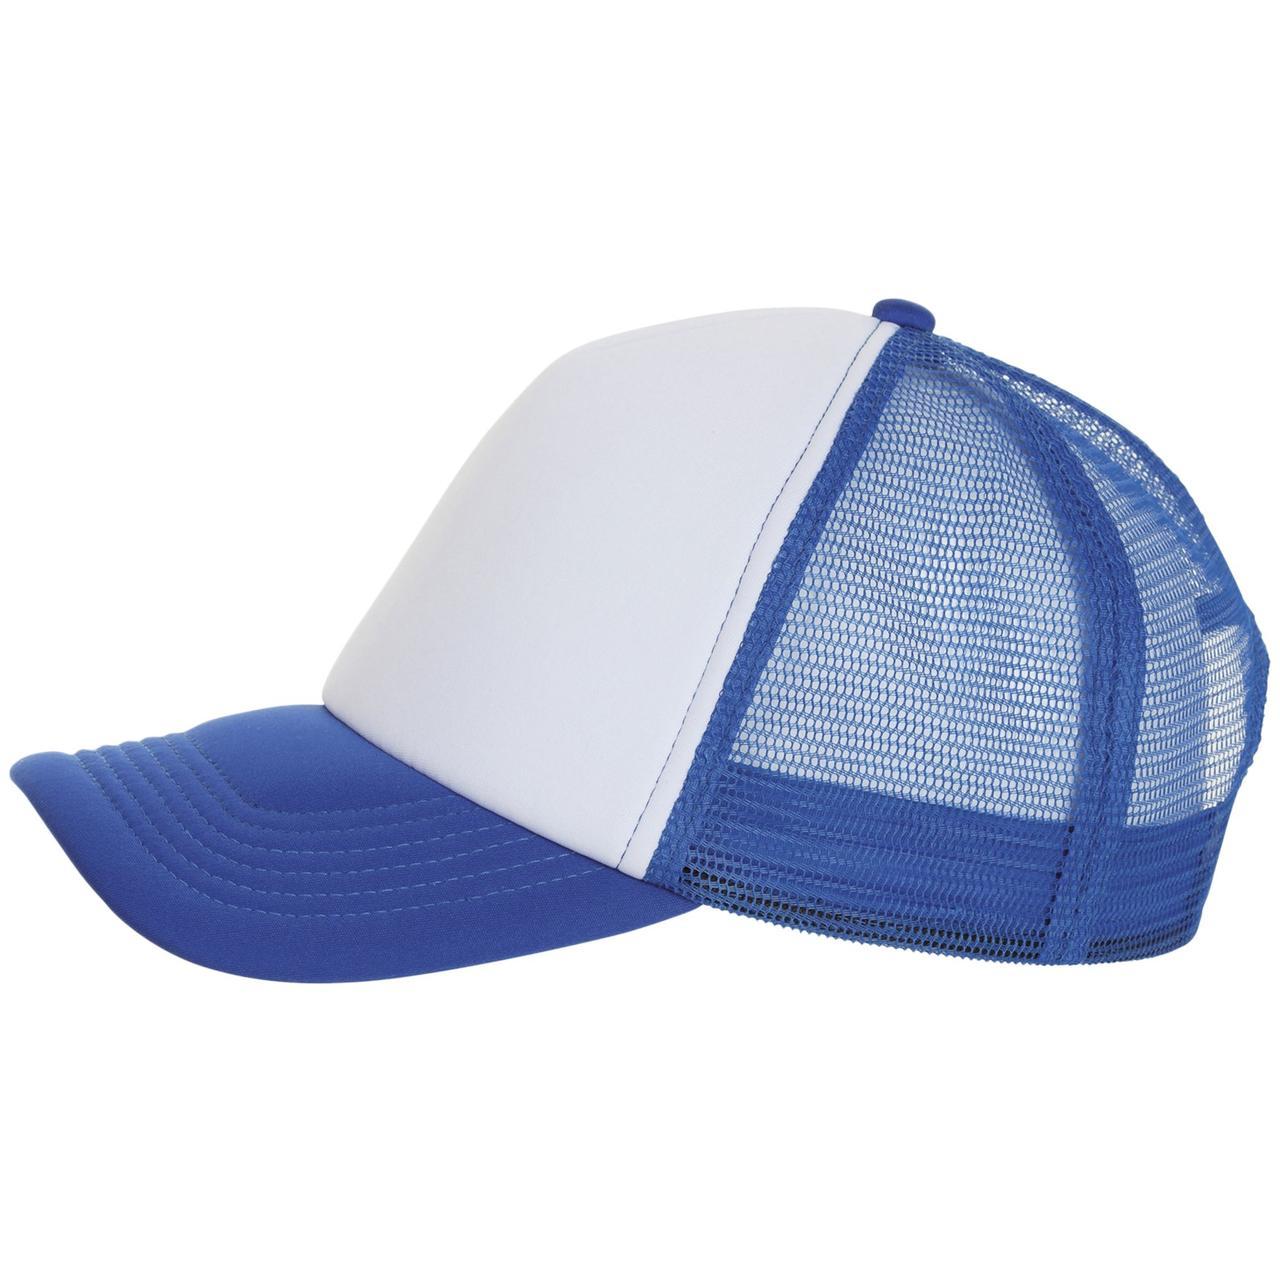 Бейсболка Bubble, синяя с белым (артикул 01668907TUN)